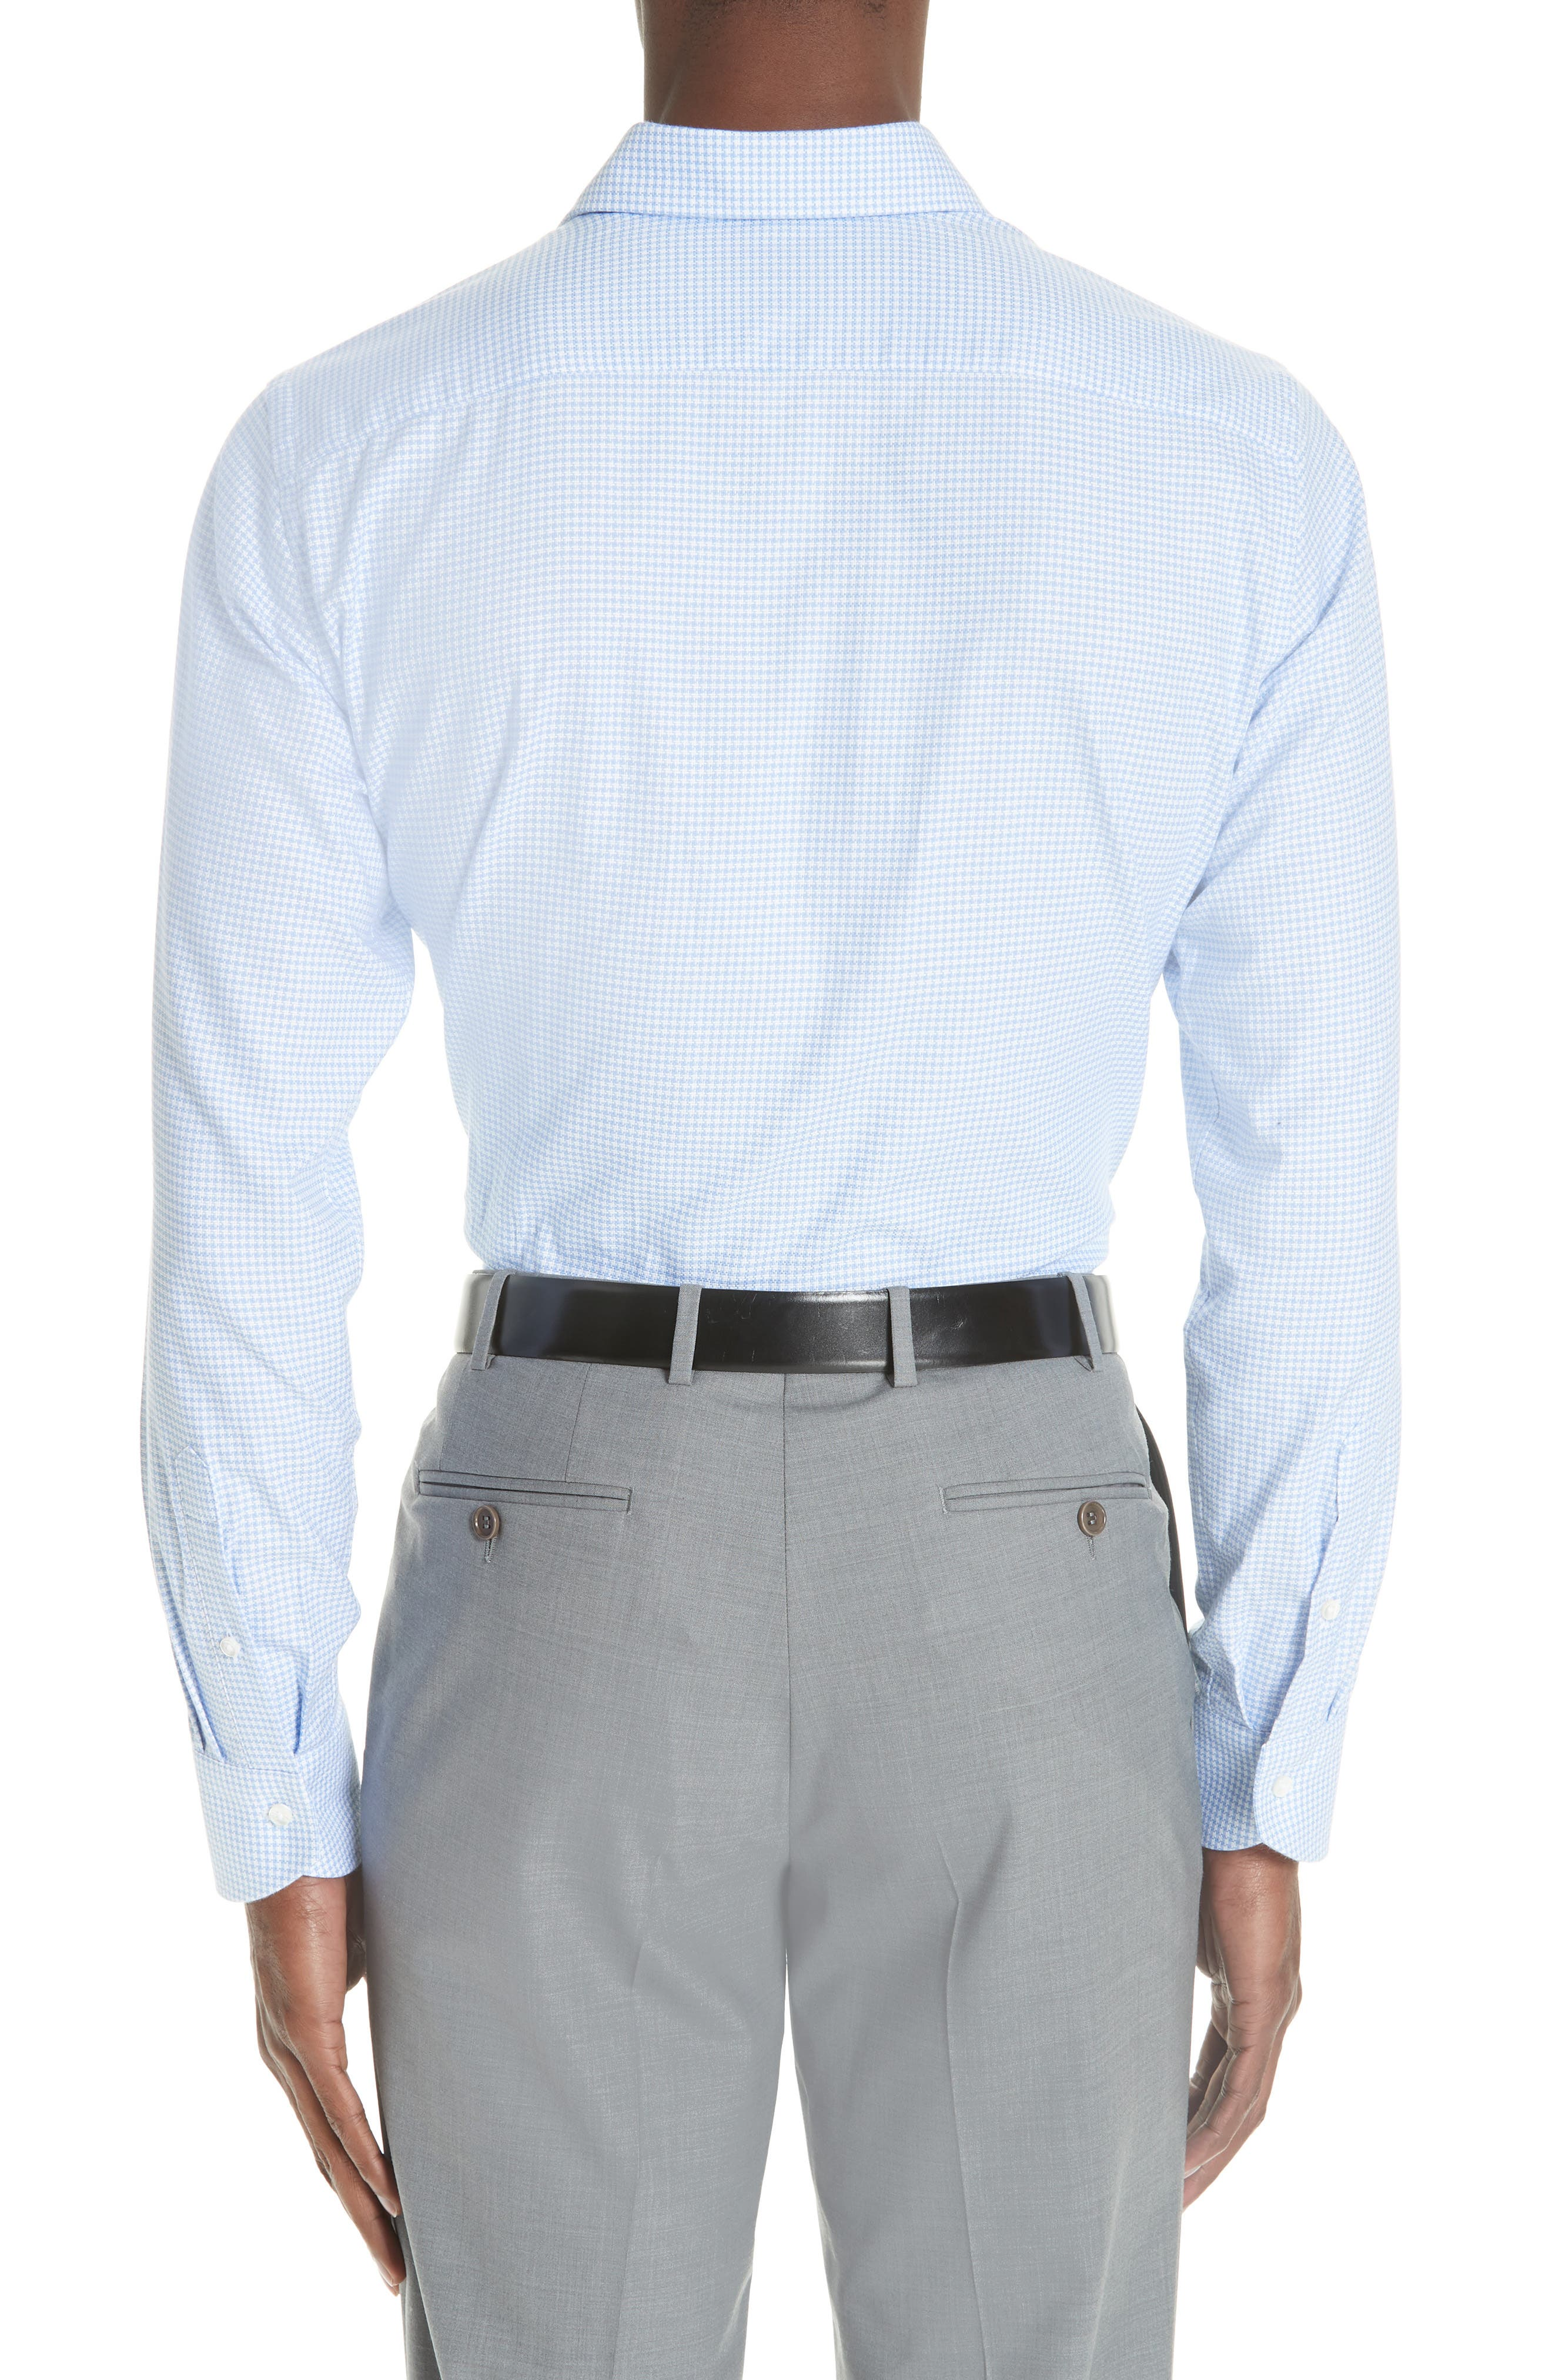 Trim Fit Houndstooth Dress Shirt,                             Alternate thumbnail 3, color,                             LIGHT BLUE